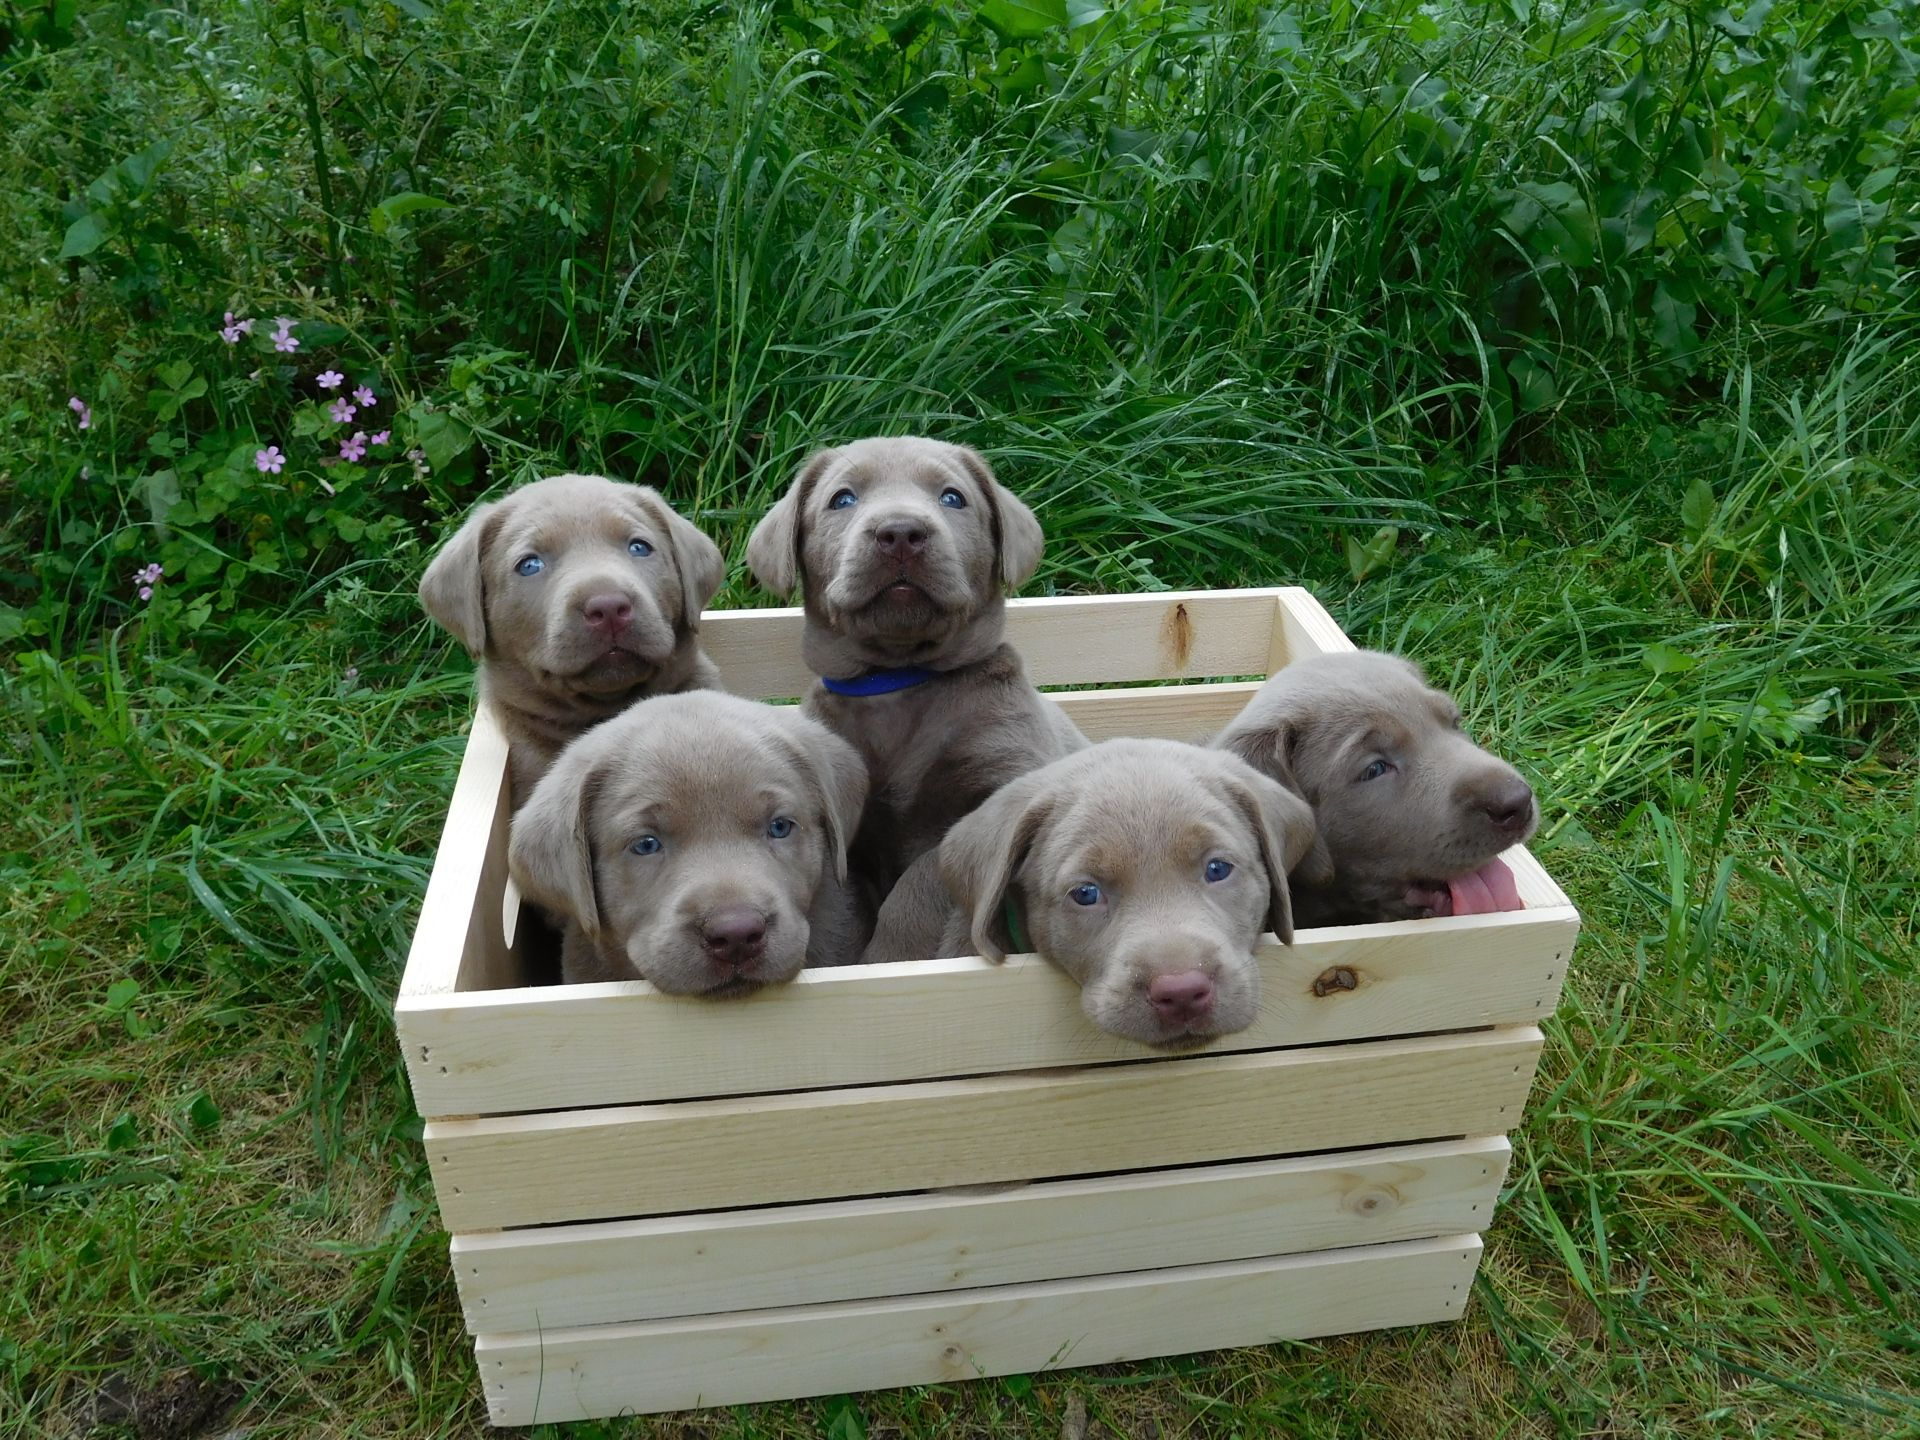 Silver Labrador Puppies For Sale Our Lyrical Labs Texas Labrador Puppies For Sale Puppies Silver Labrador Puppies